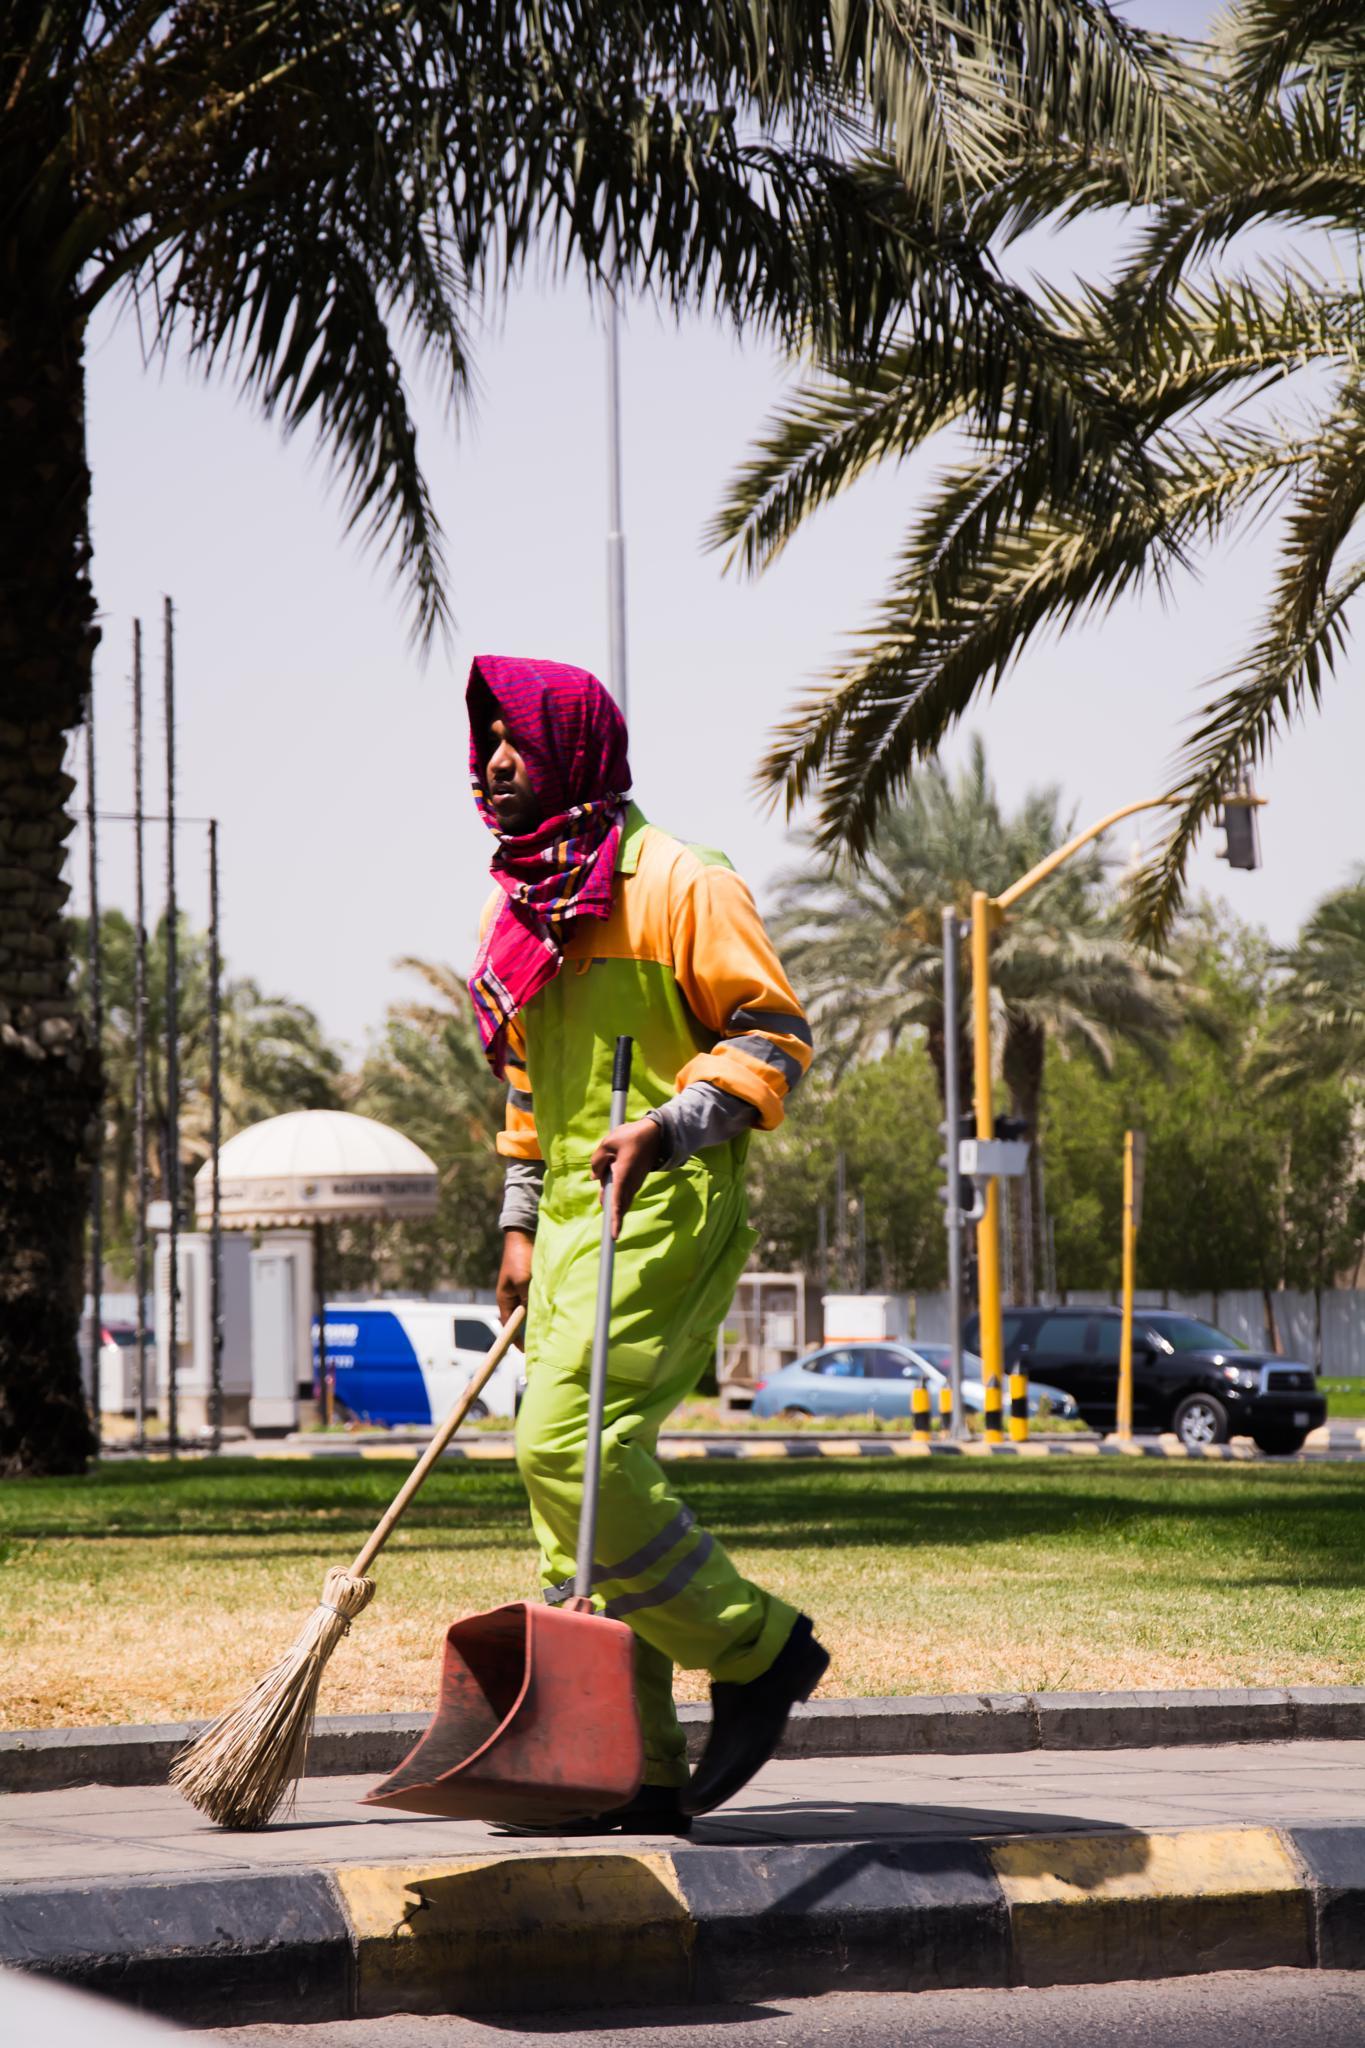 staunch man  (Under 47 °C)  by Taleb_Alkathiri